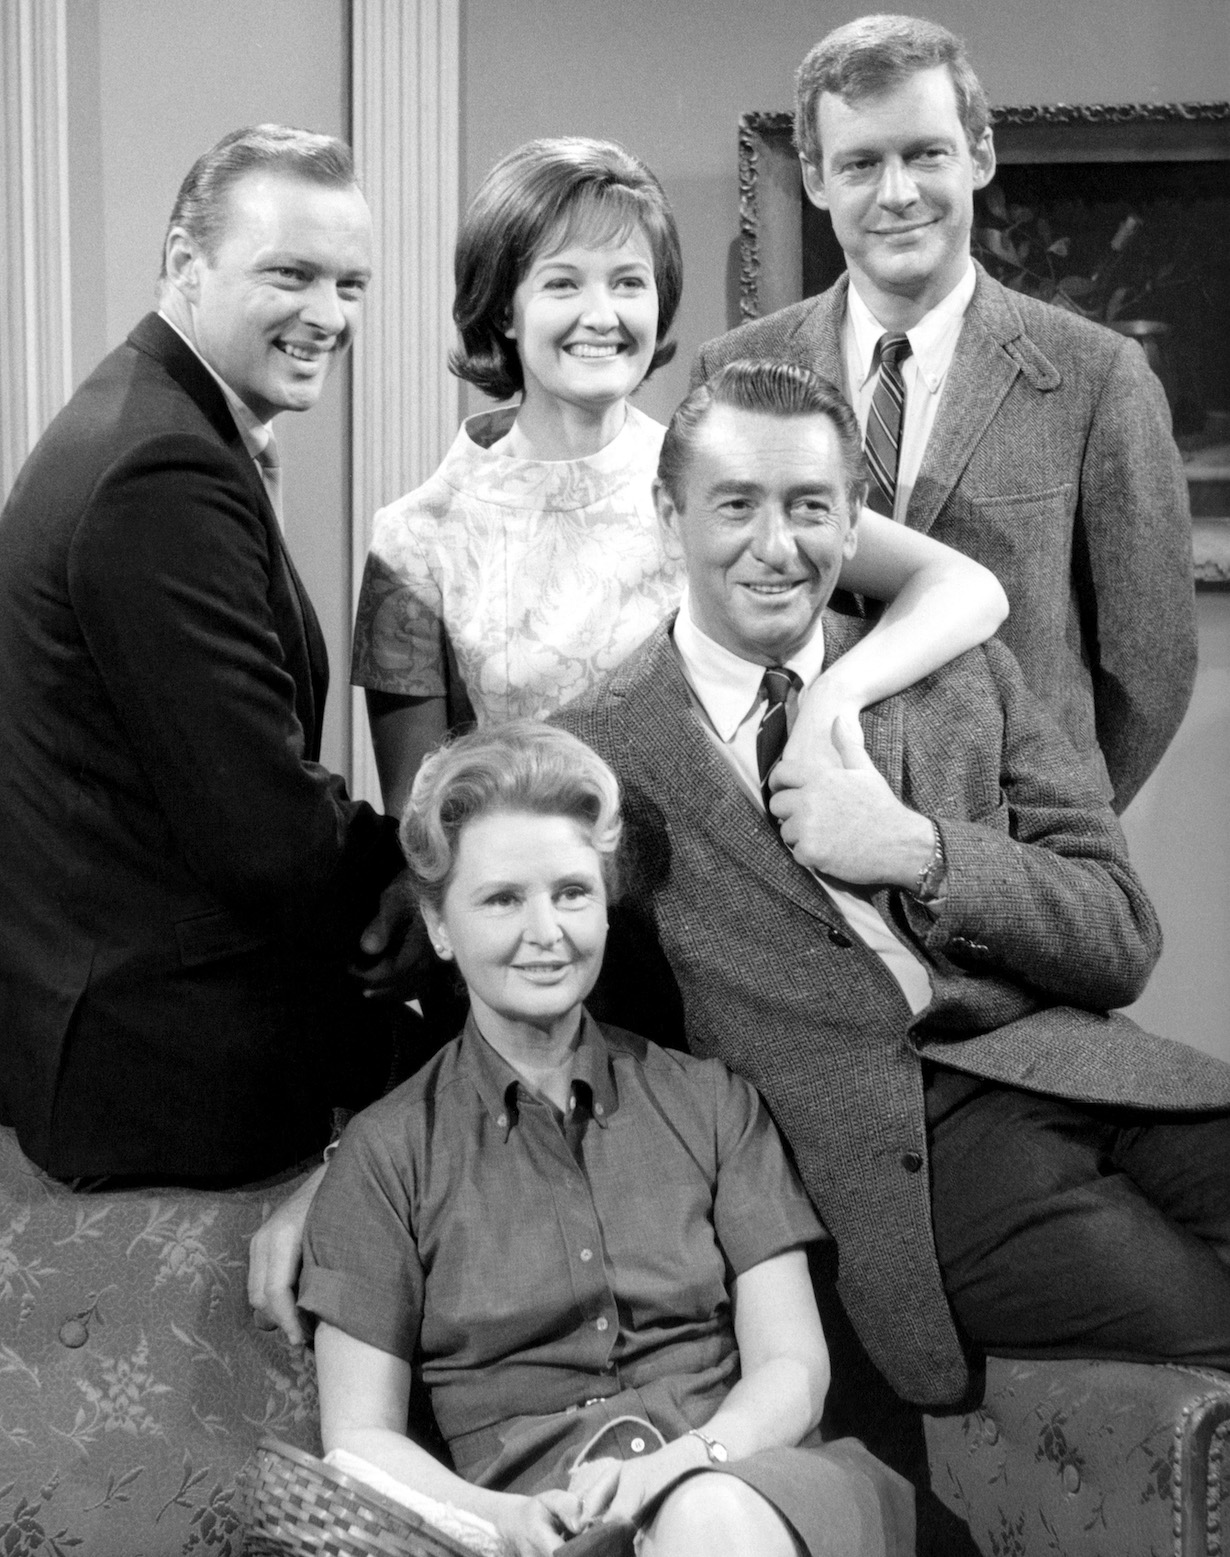 DAYS OF OUR LIVES, Macdonald Carey, Frances Reid, John Clarke, Marie Cheatham, Edward Mallory, (1960s), 1965-, (c)NBC/courtesy Everett Collection